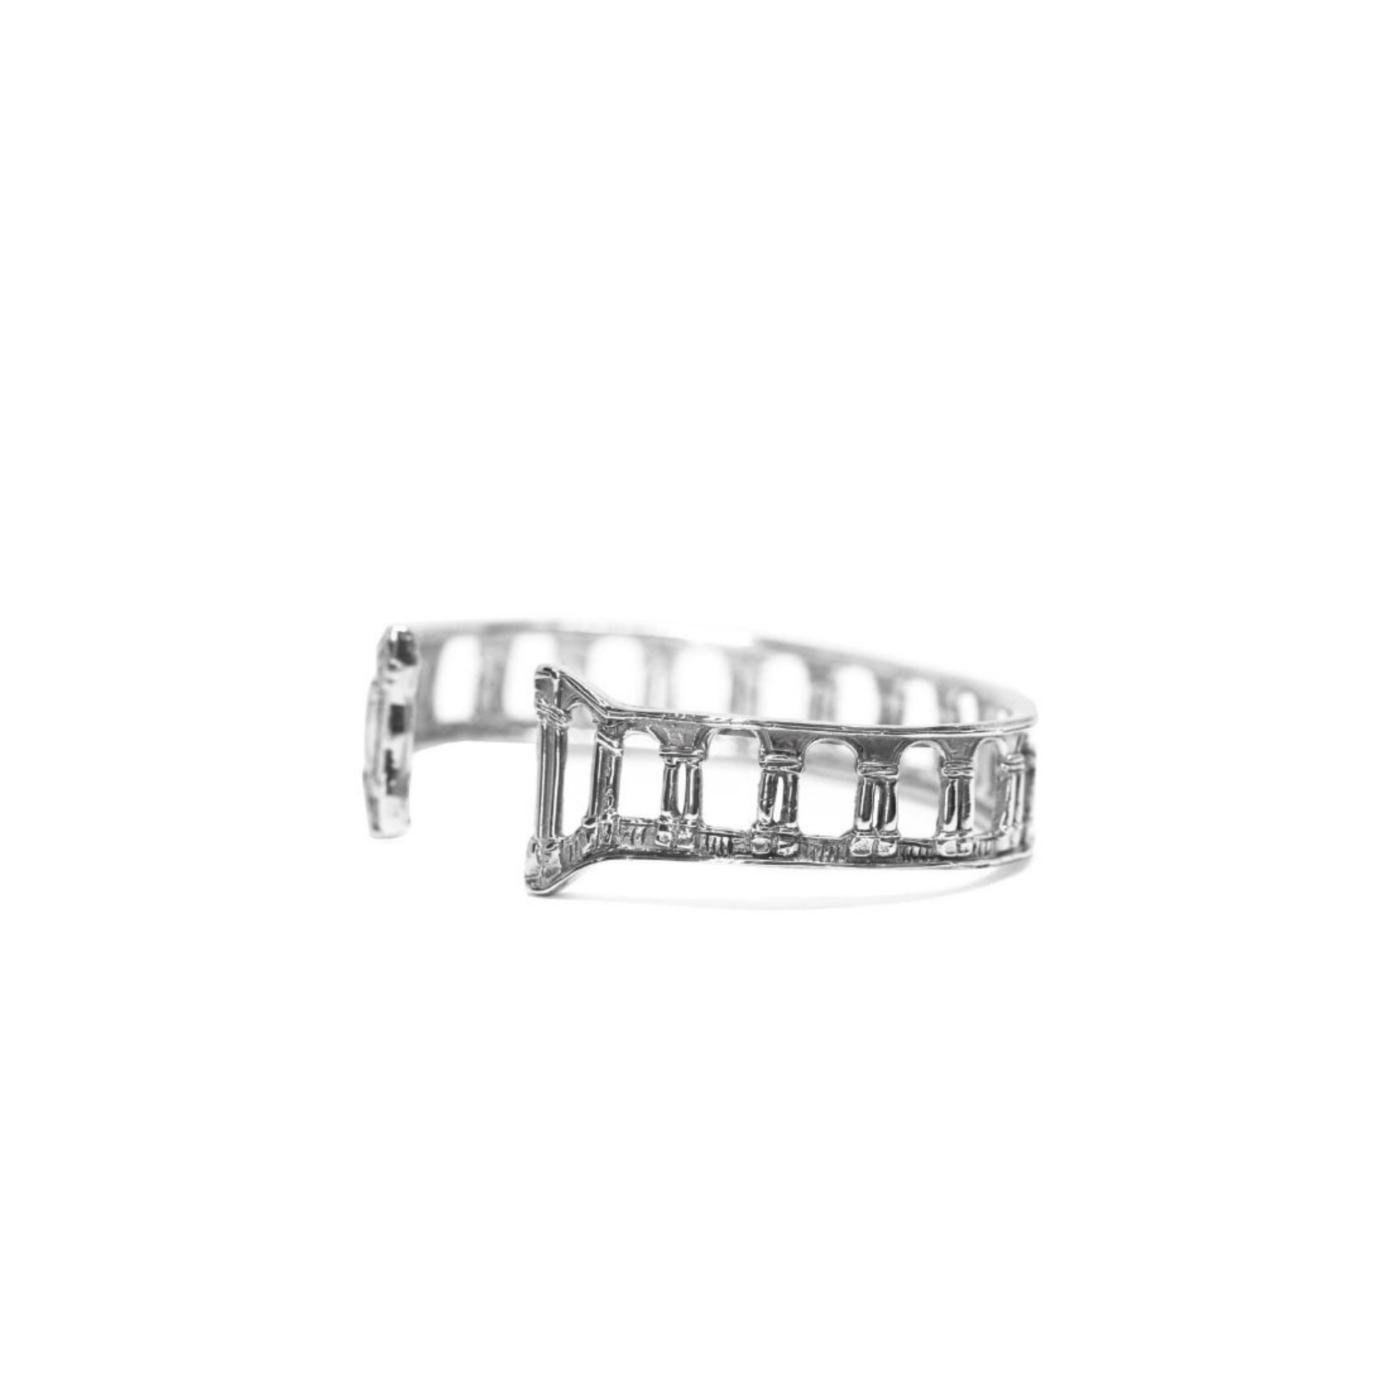 Brera Bracelet 925 Sterling Silver